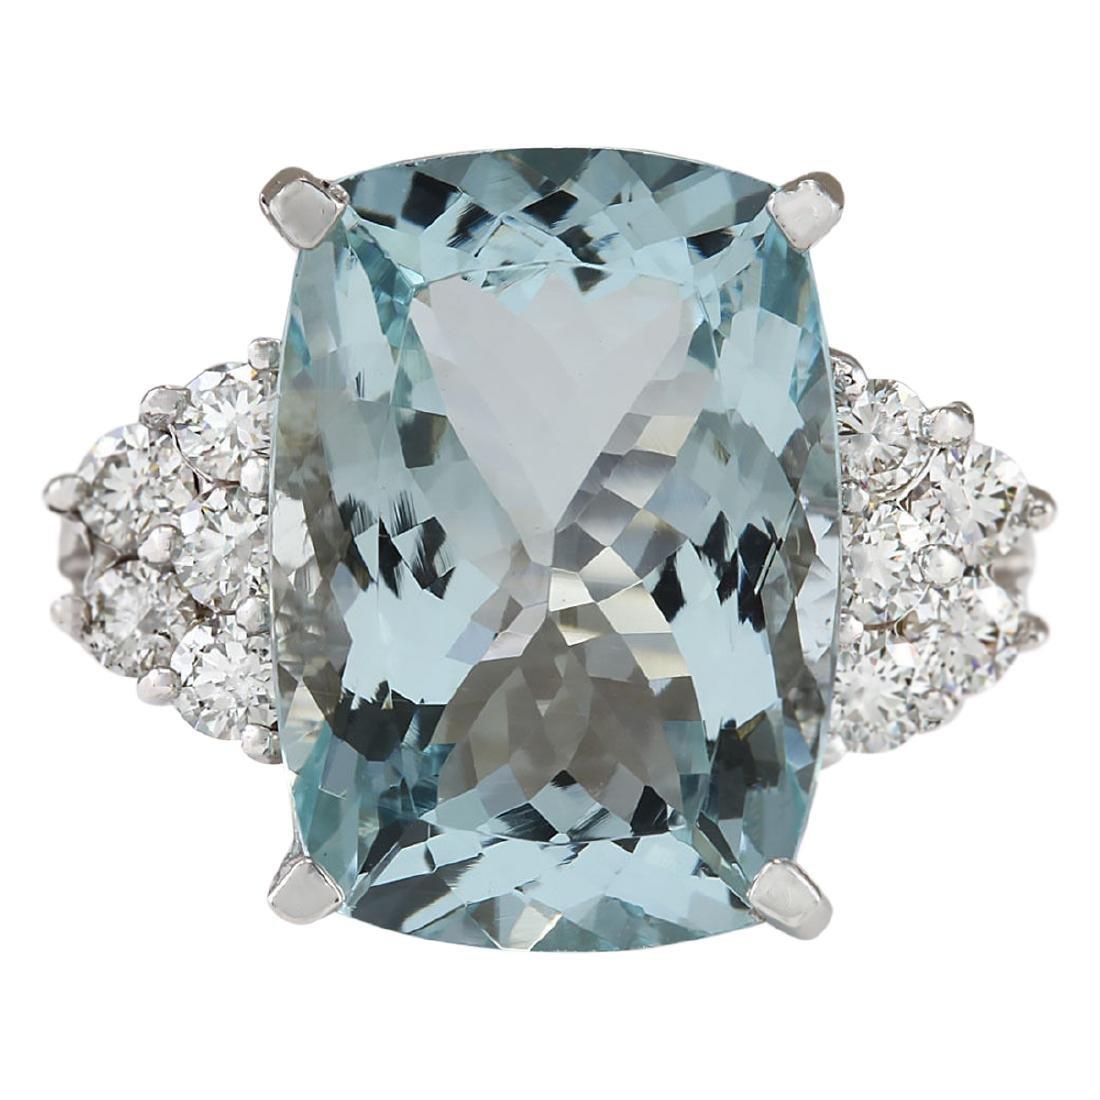 8.13 CTW Natural Aquamarine And Diamond Ring In 18K